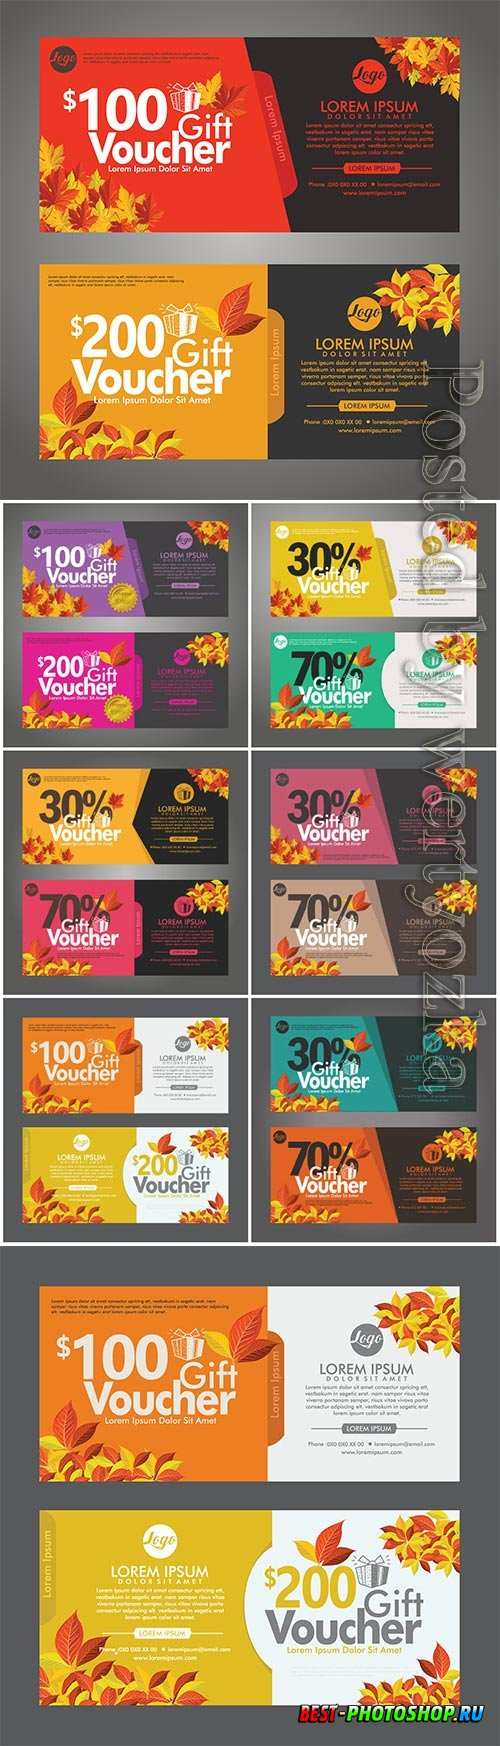 Autumn gift voucher discount cards vector template